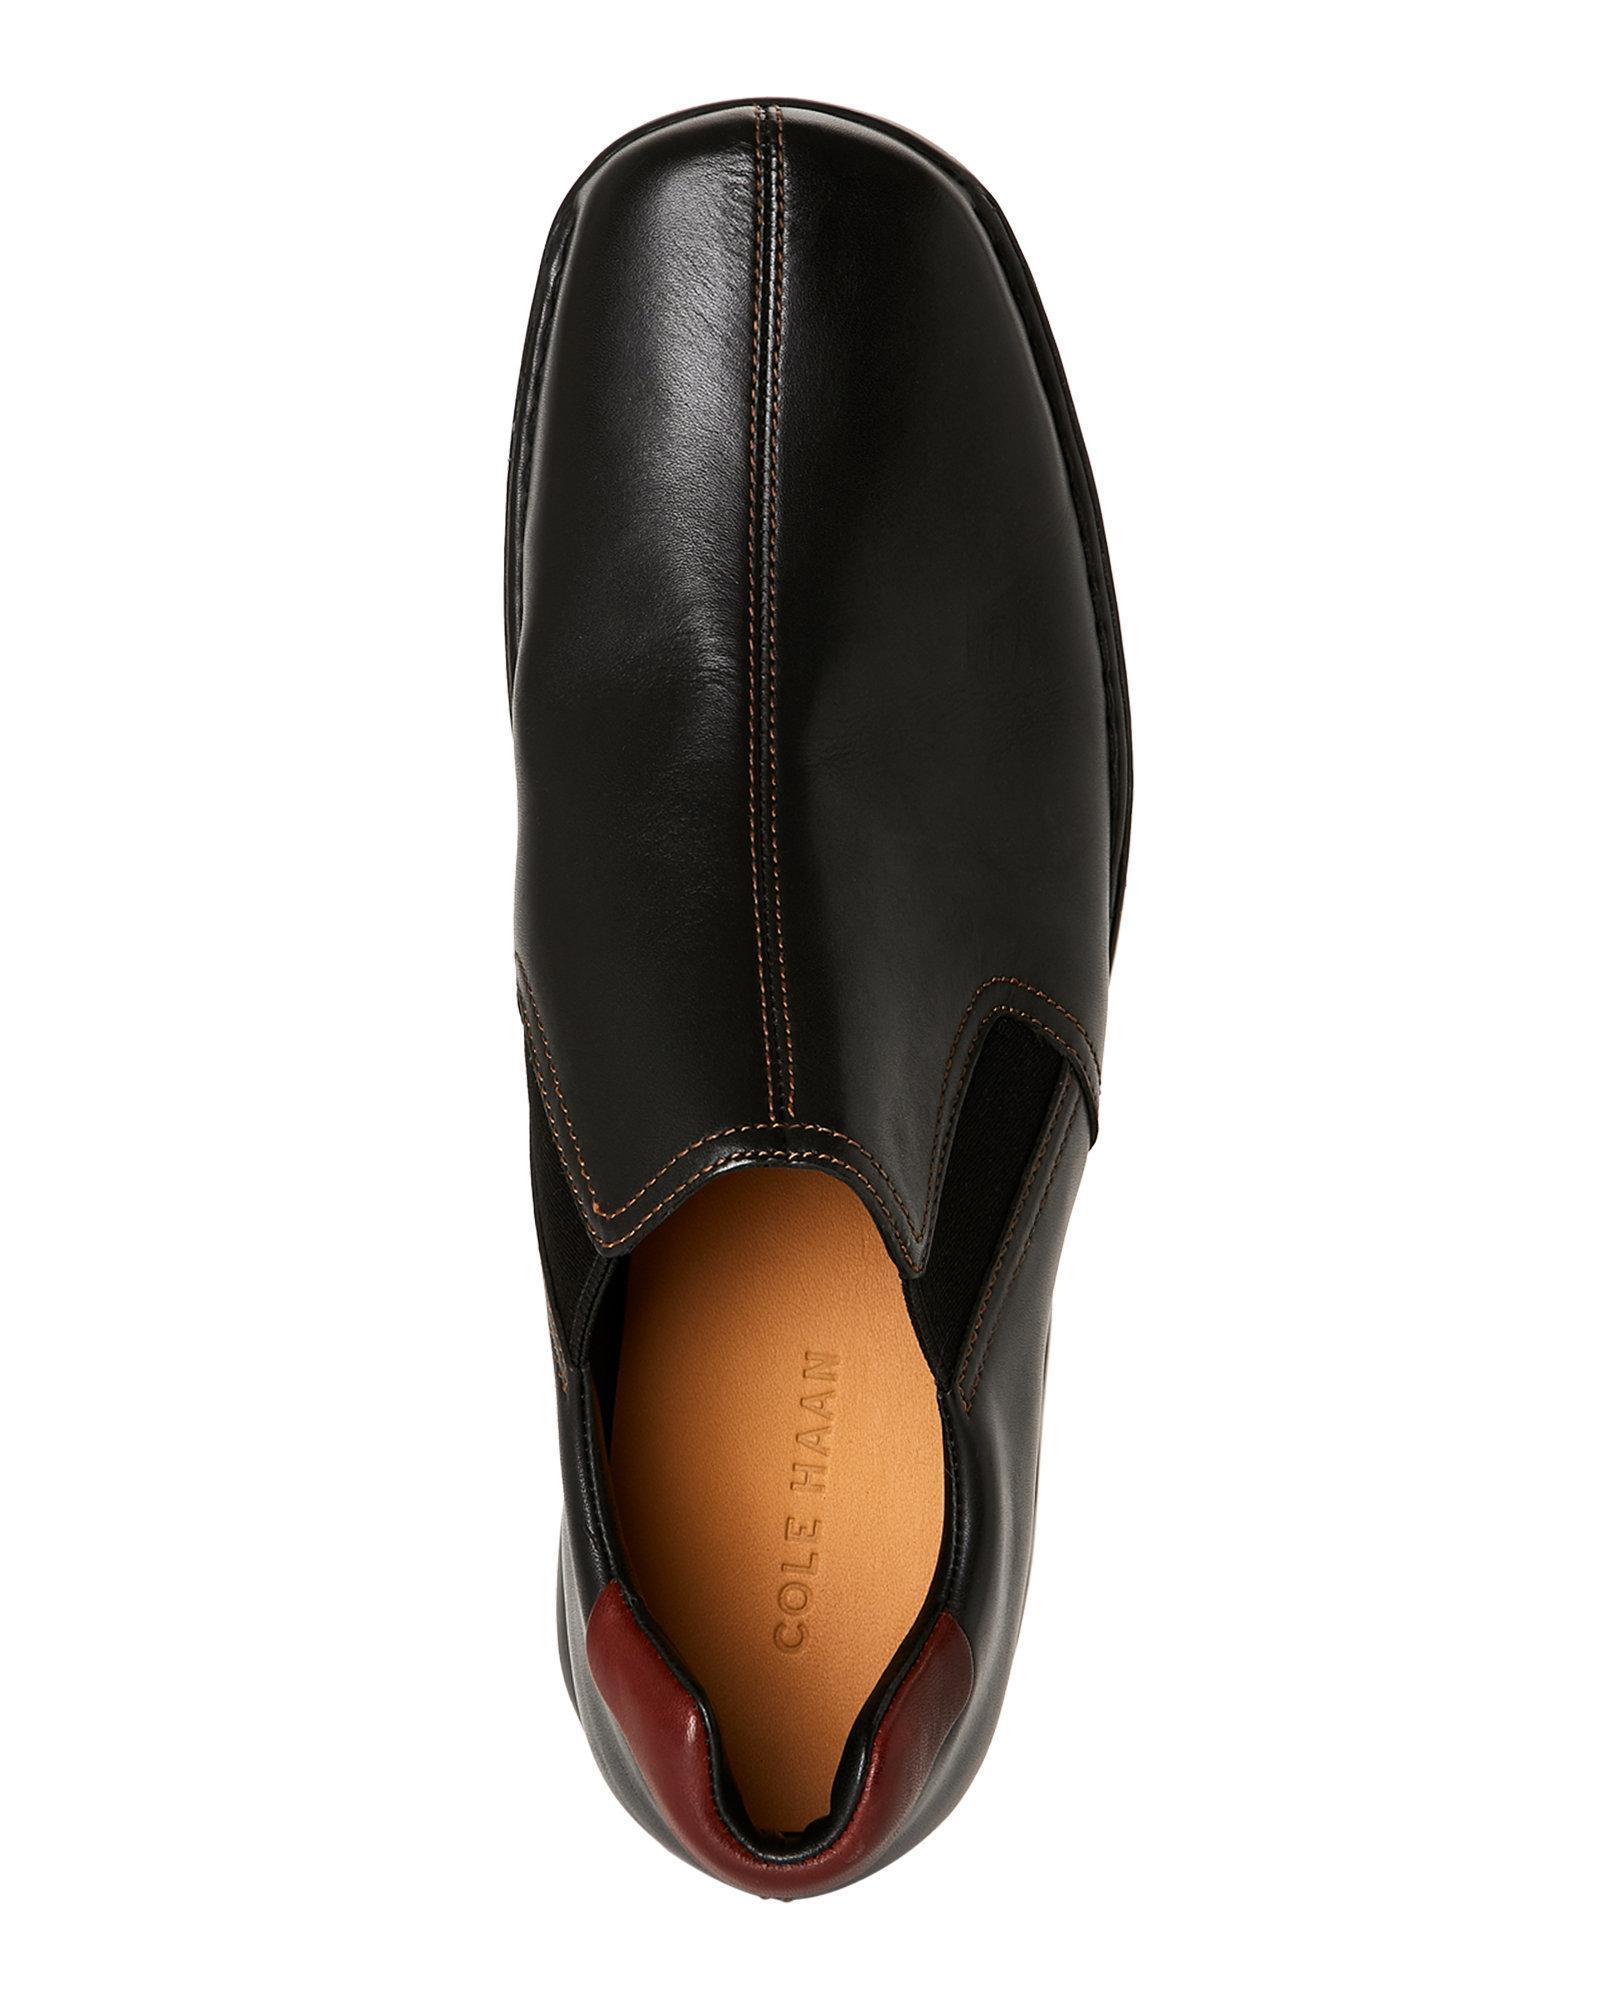 de42c22c6e9 Lyst - Cole Haan Black Zeno Slip-On Loafers in Black for Men